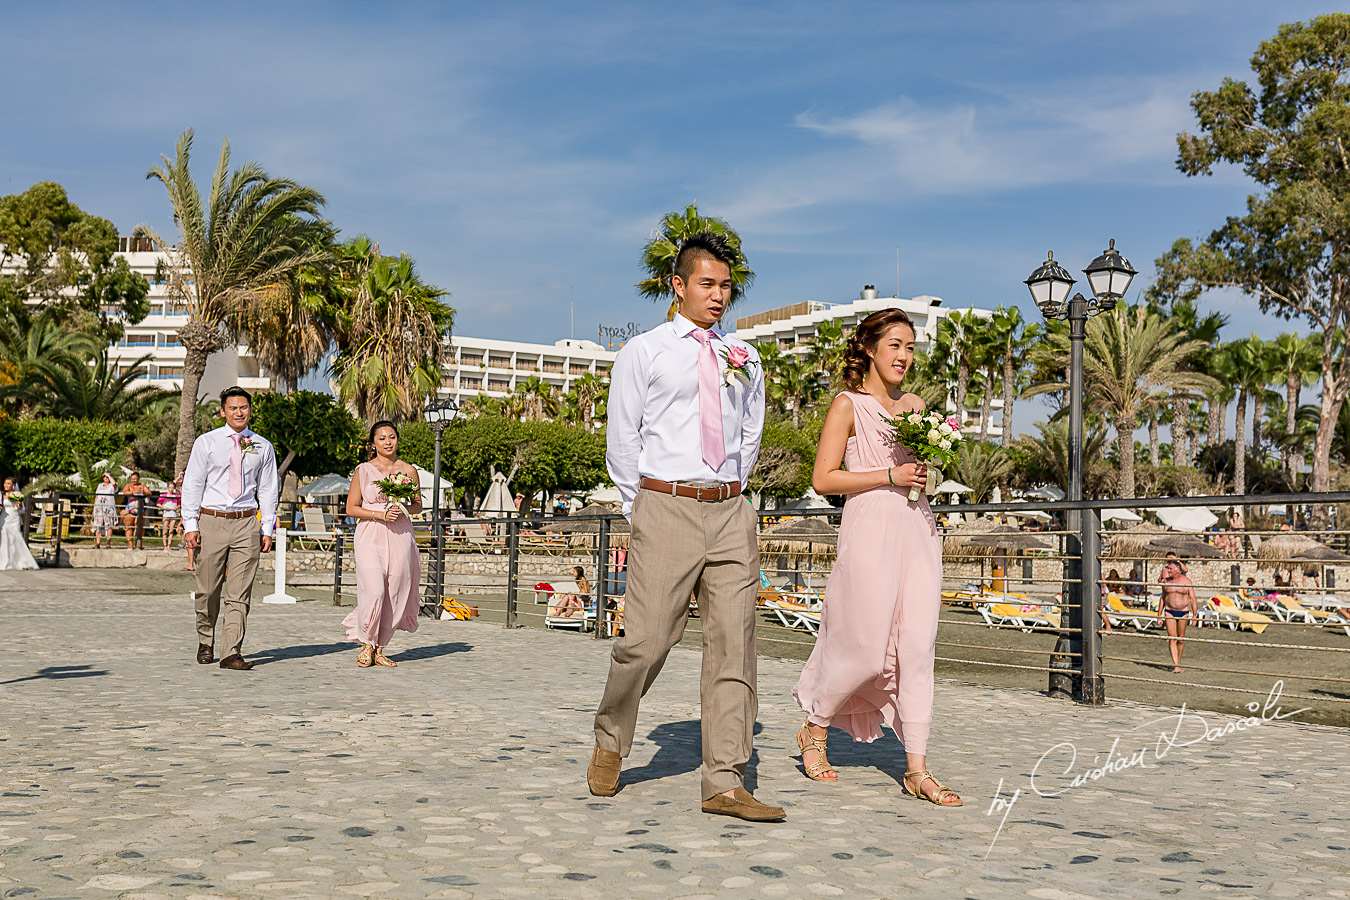 Elias Beach Hotel Wedding - Johnson & Helen - 24